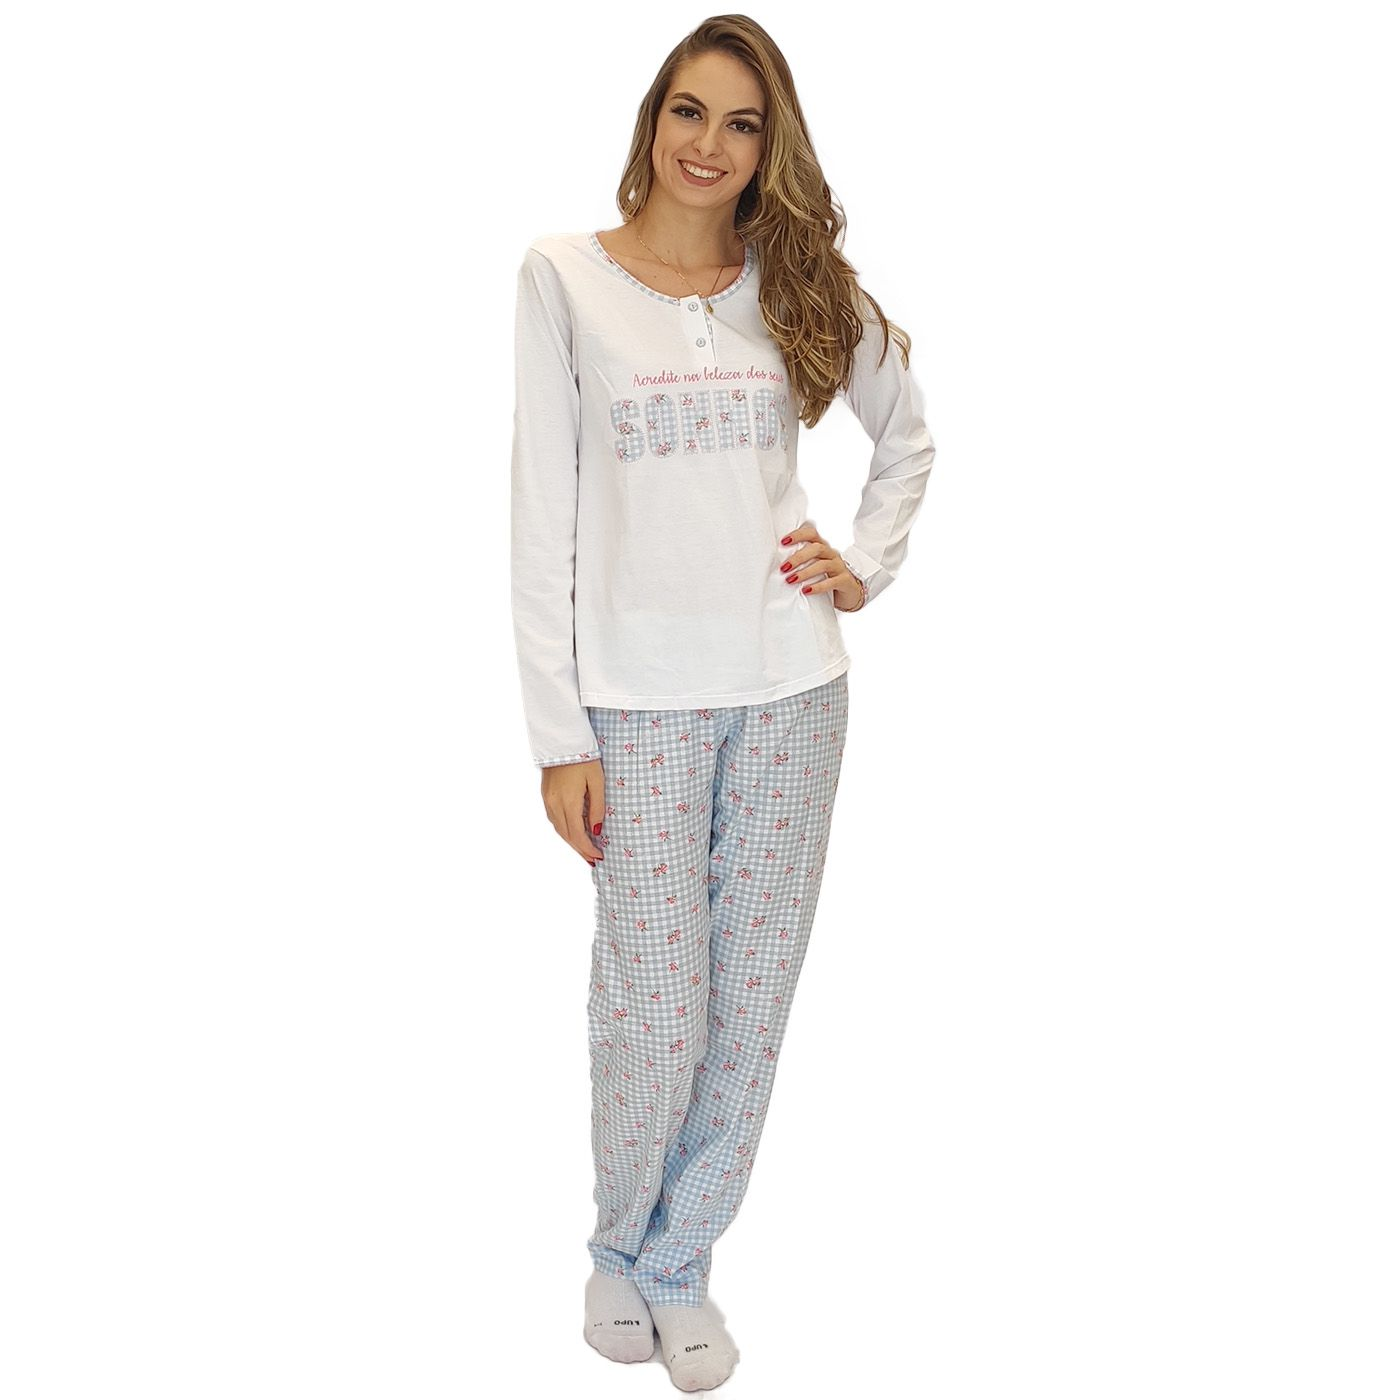 Pijama feminino adulto frio blusa botão calça xadrez